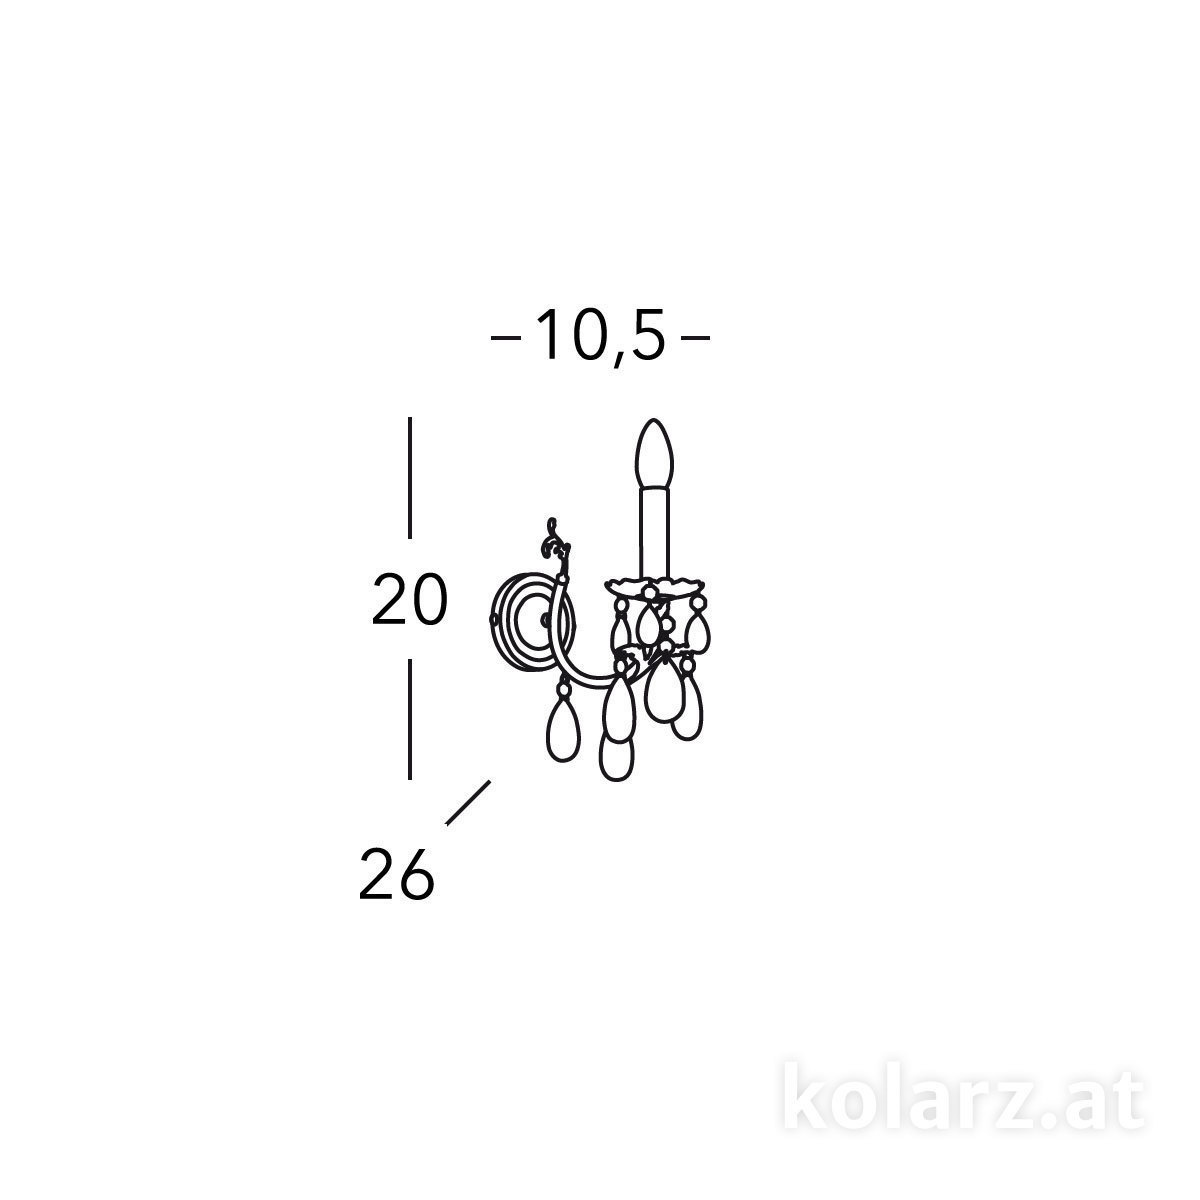 3003-61-3-KoT__me30-s1.jpg